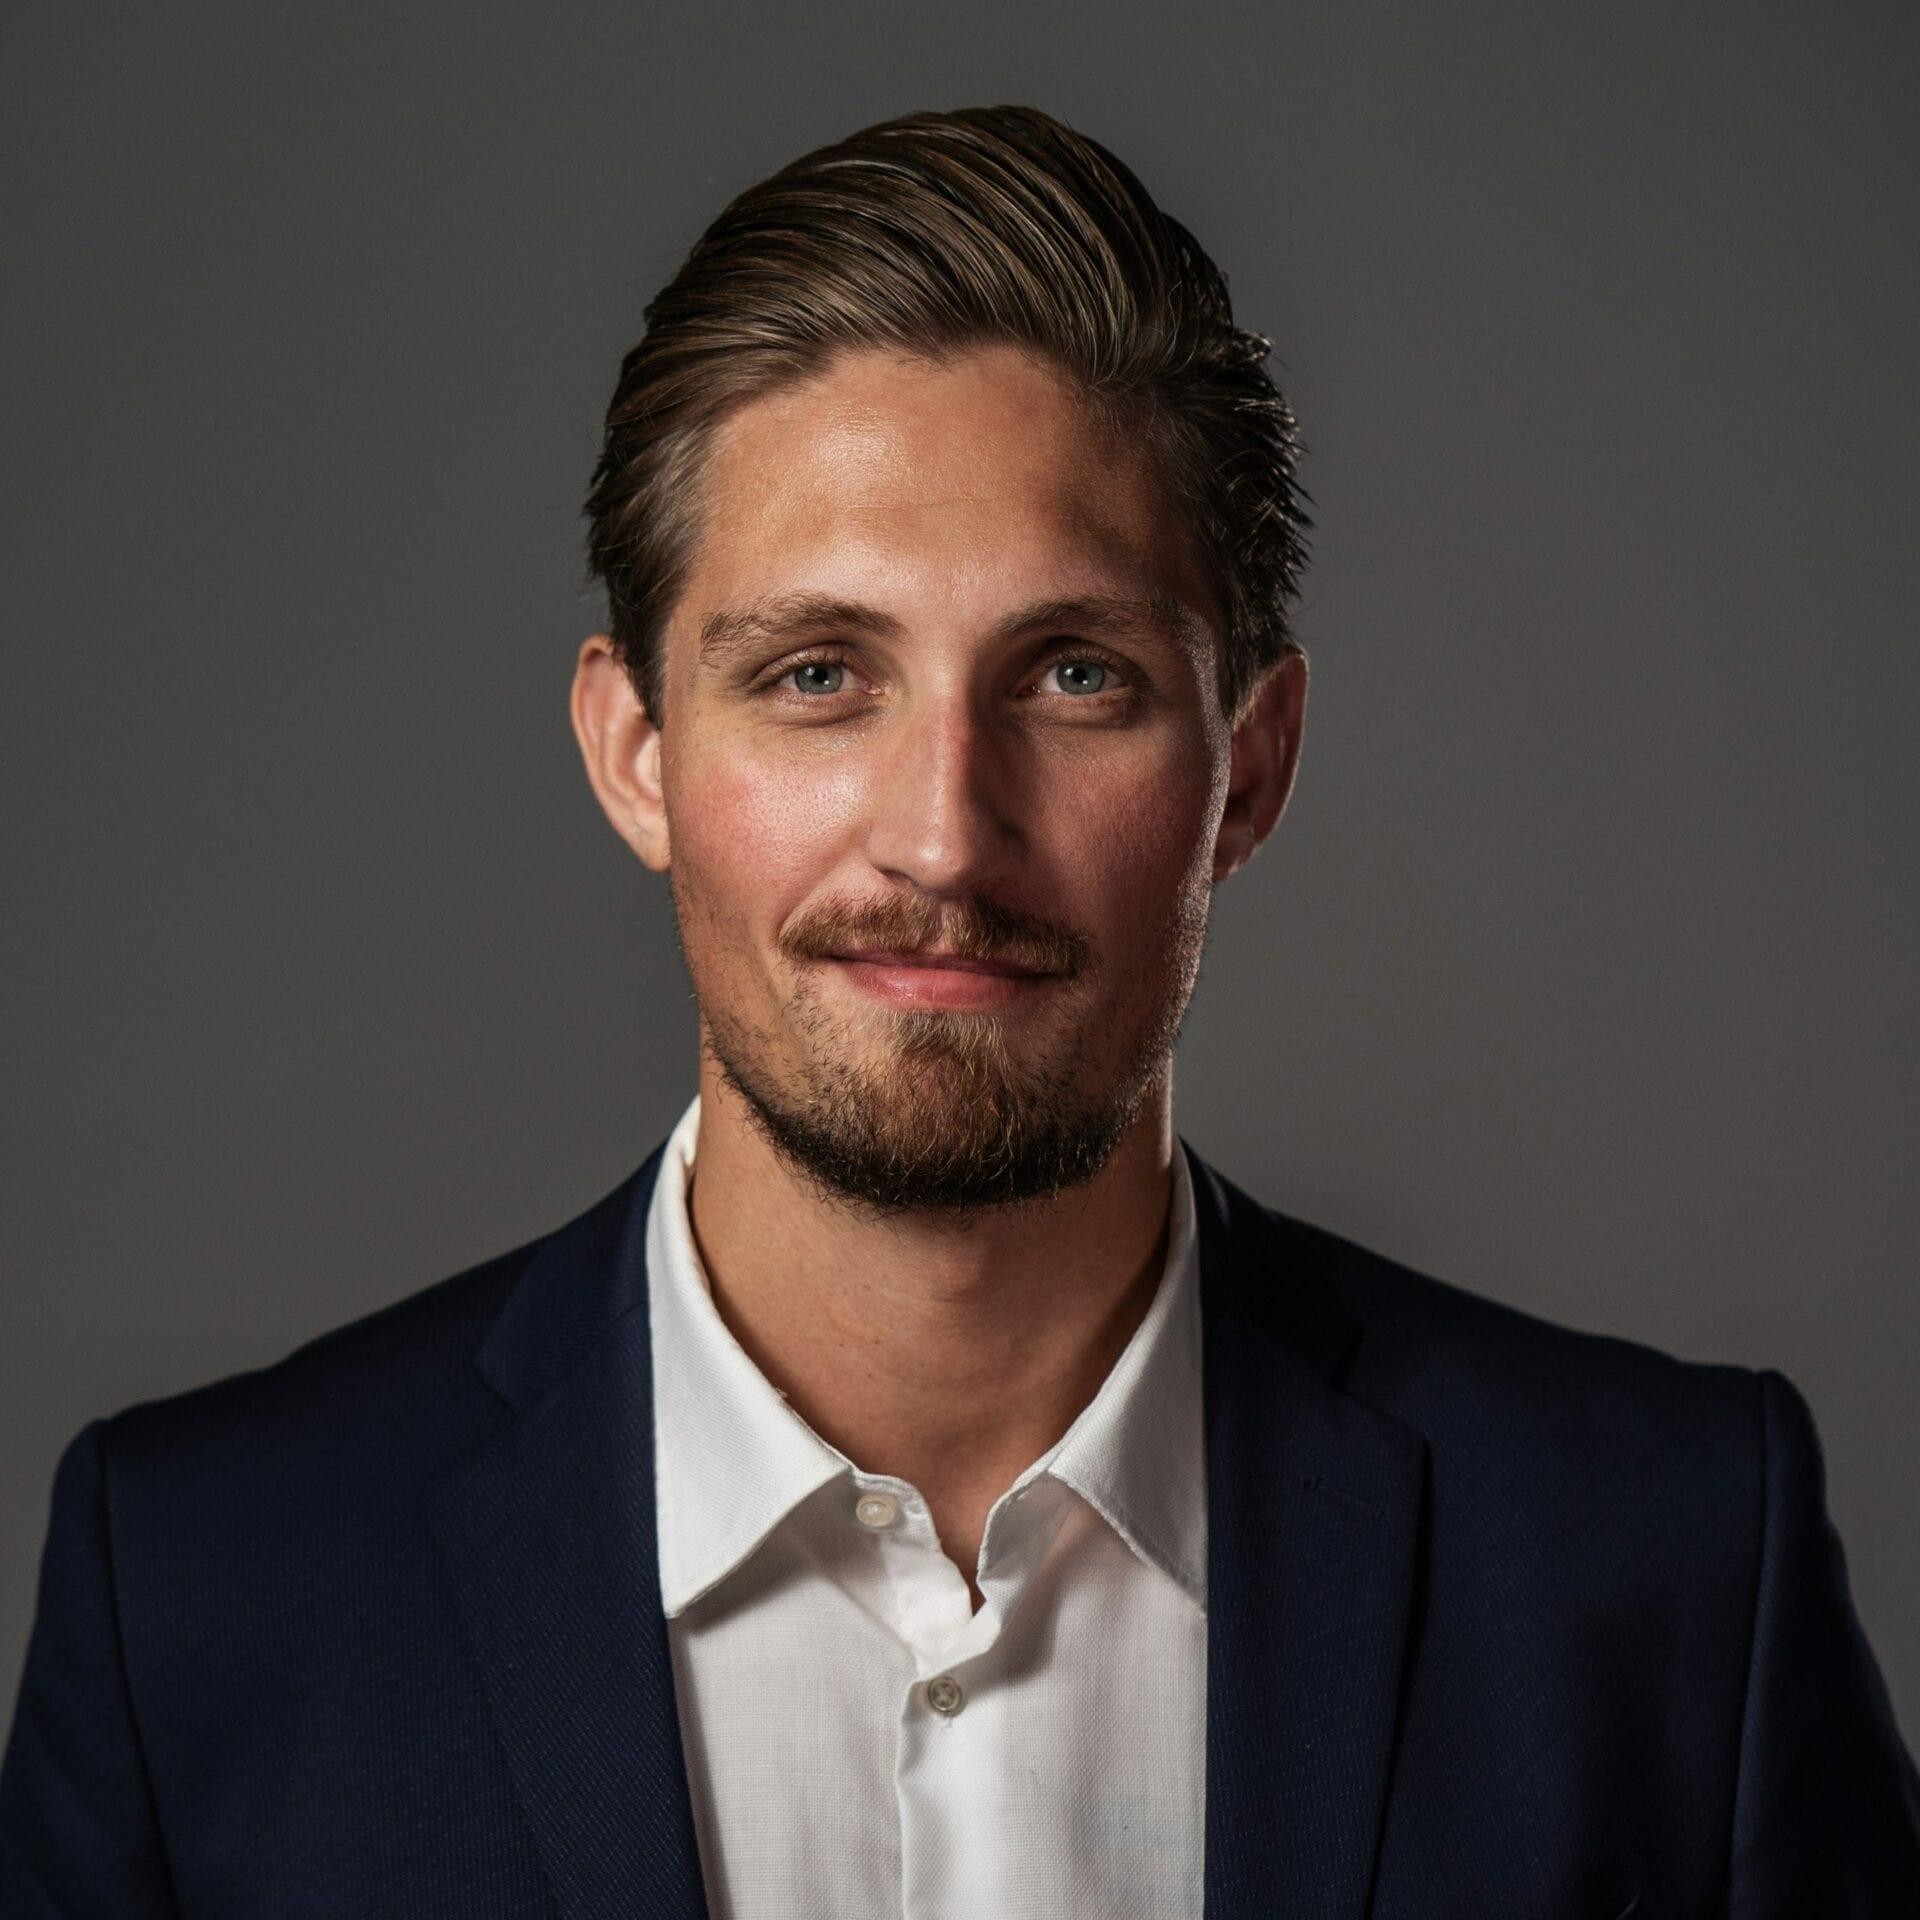 Peter N. Jansen